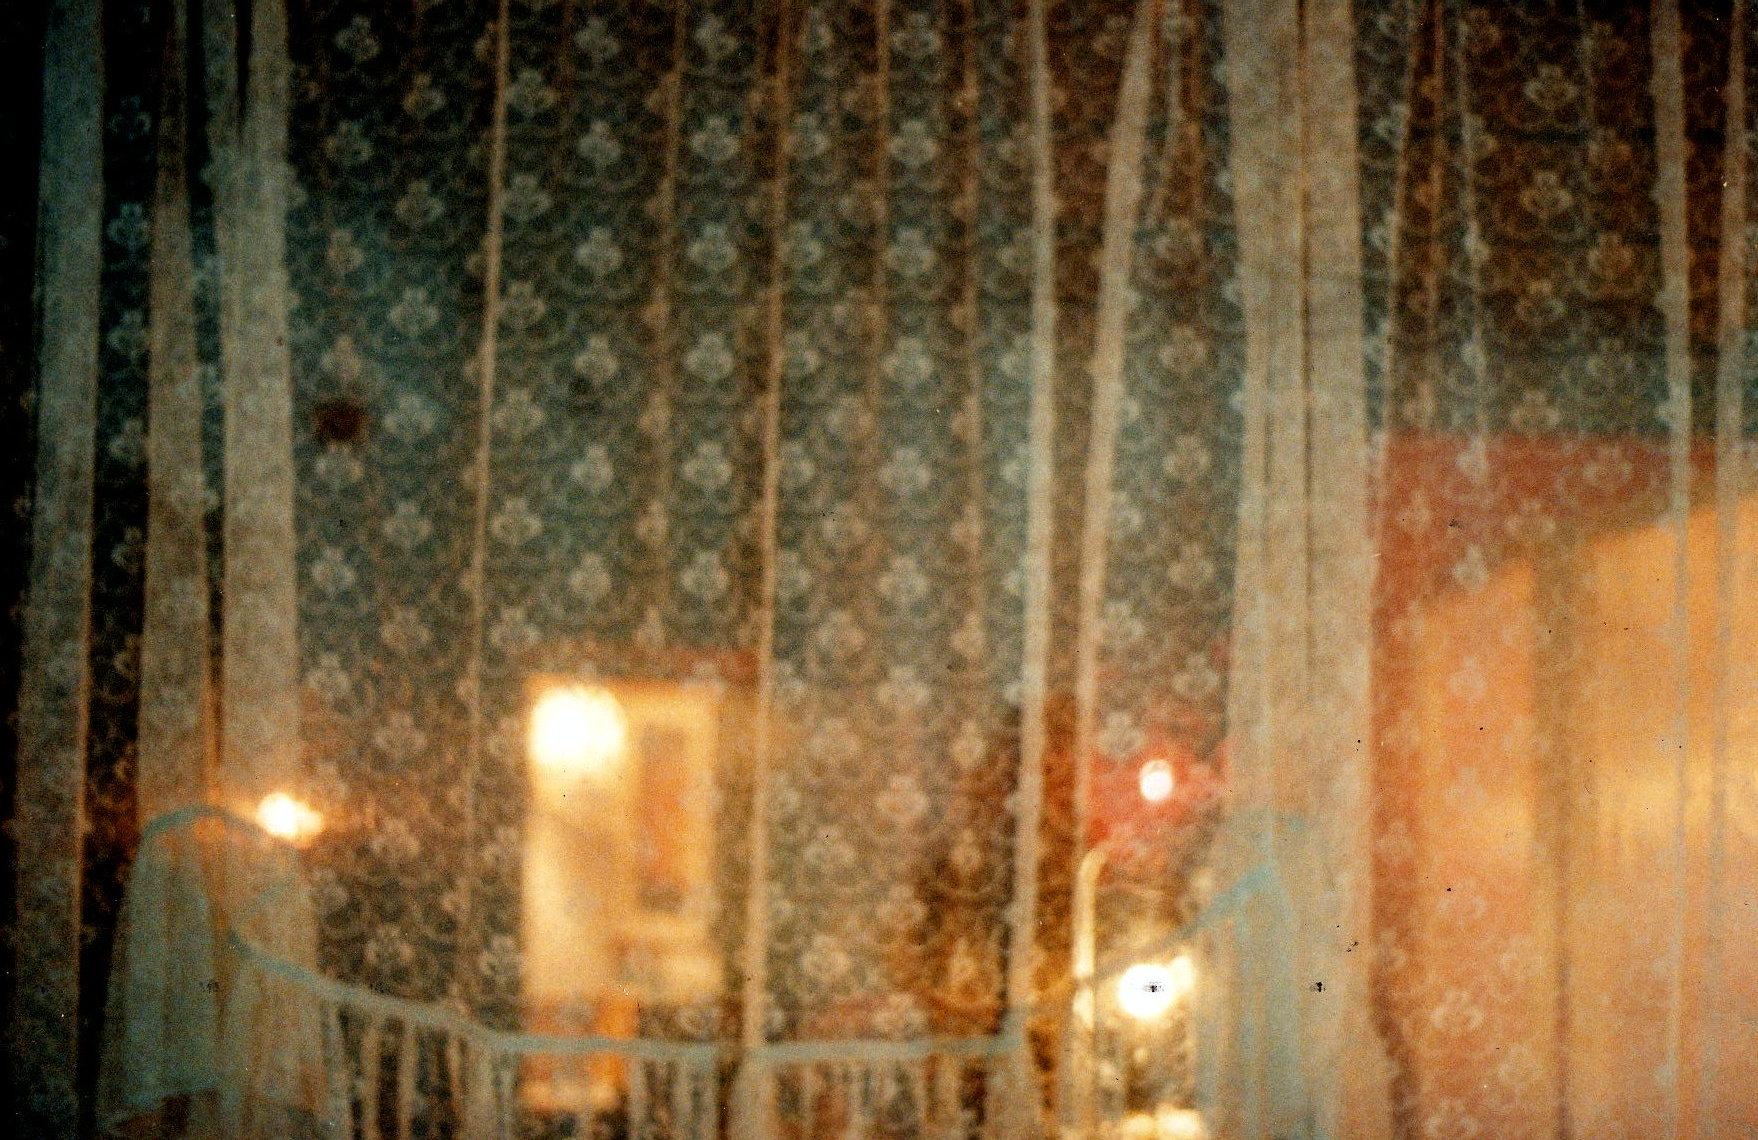 Installation shot, interior view from exterior